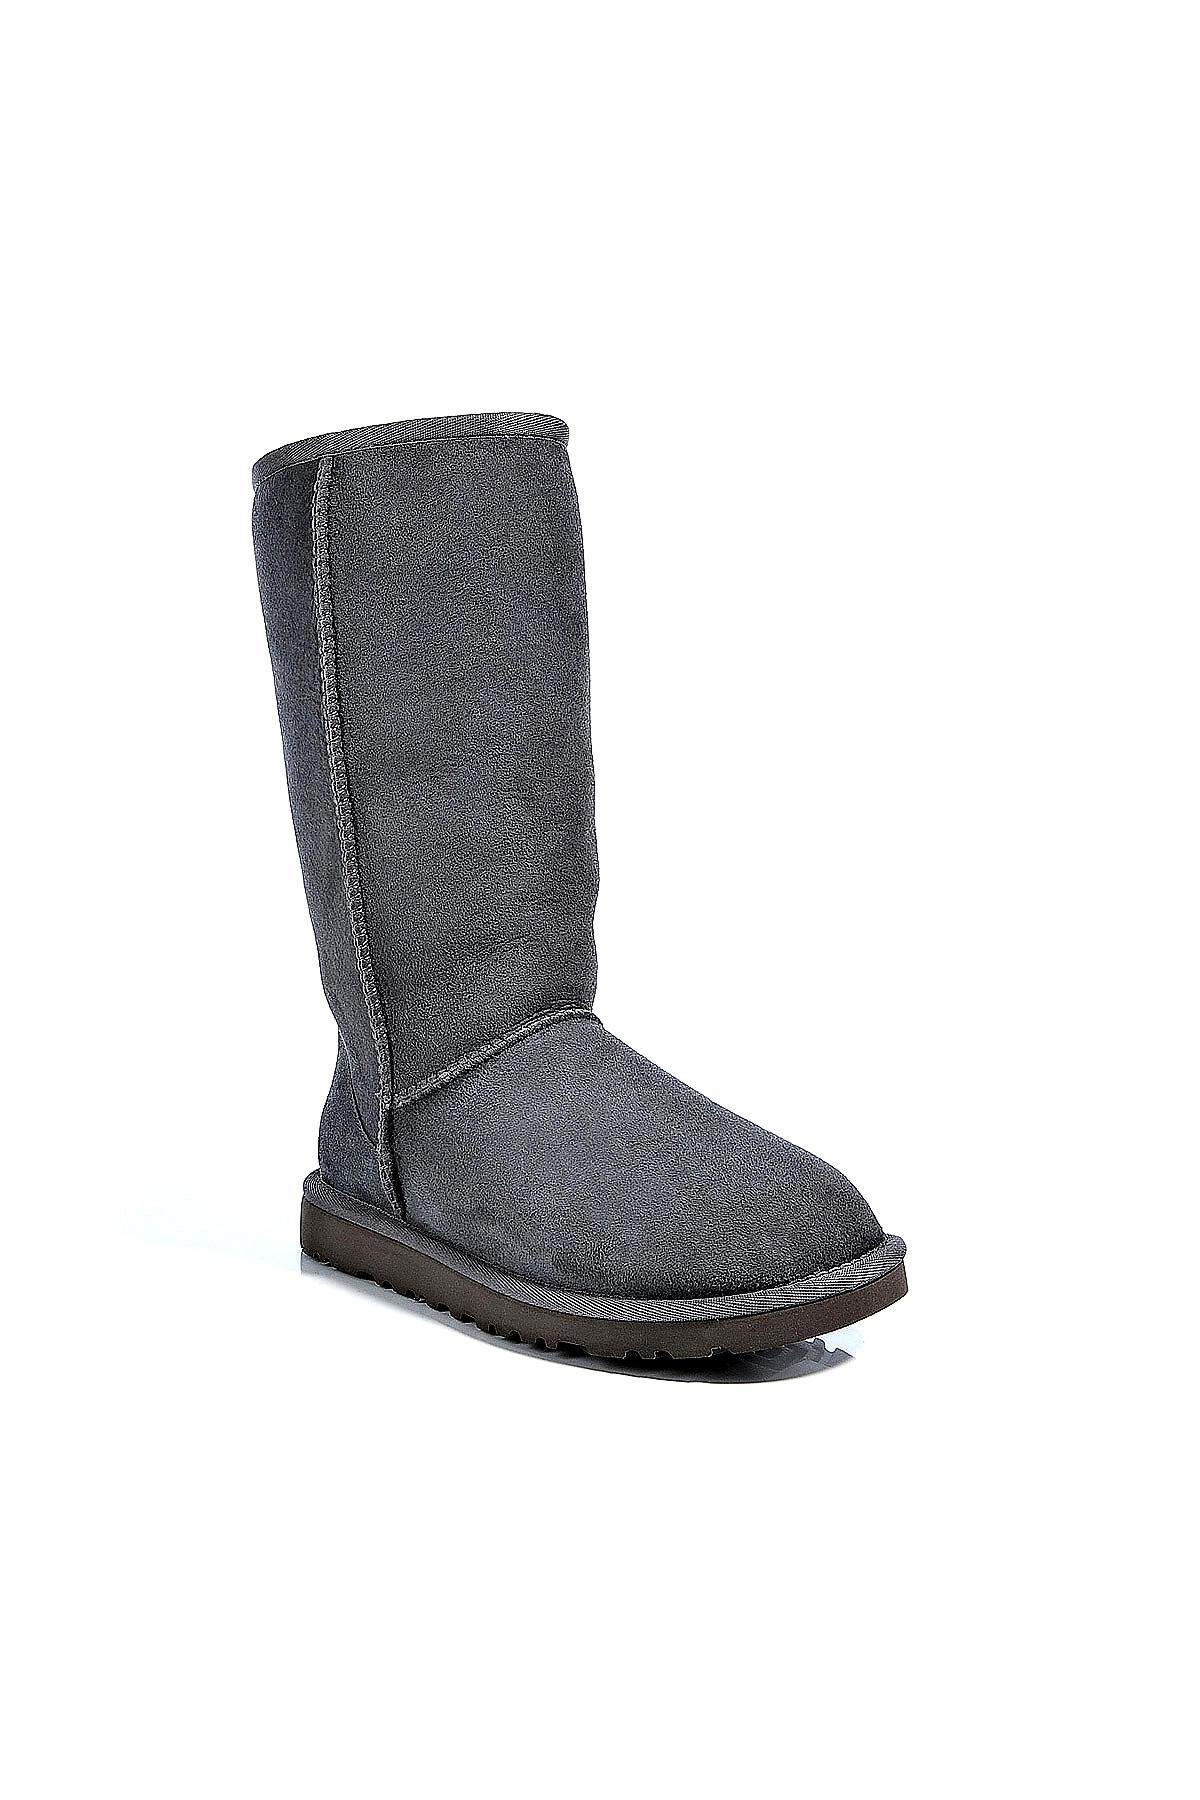 ugg grey tall boots